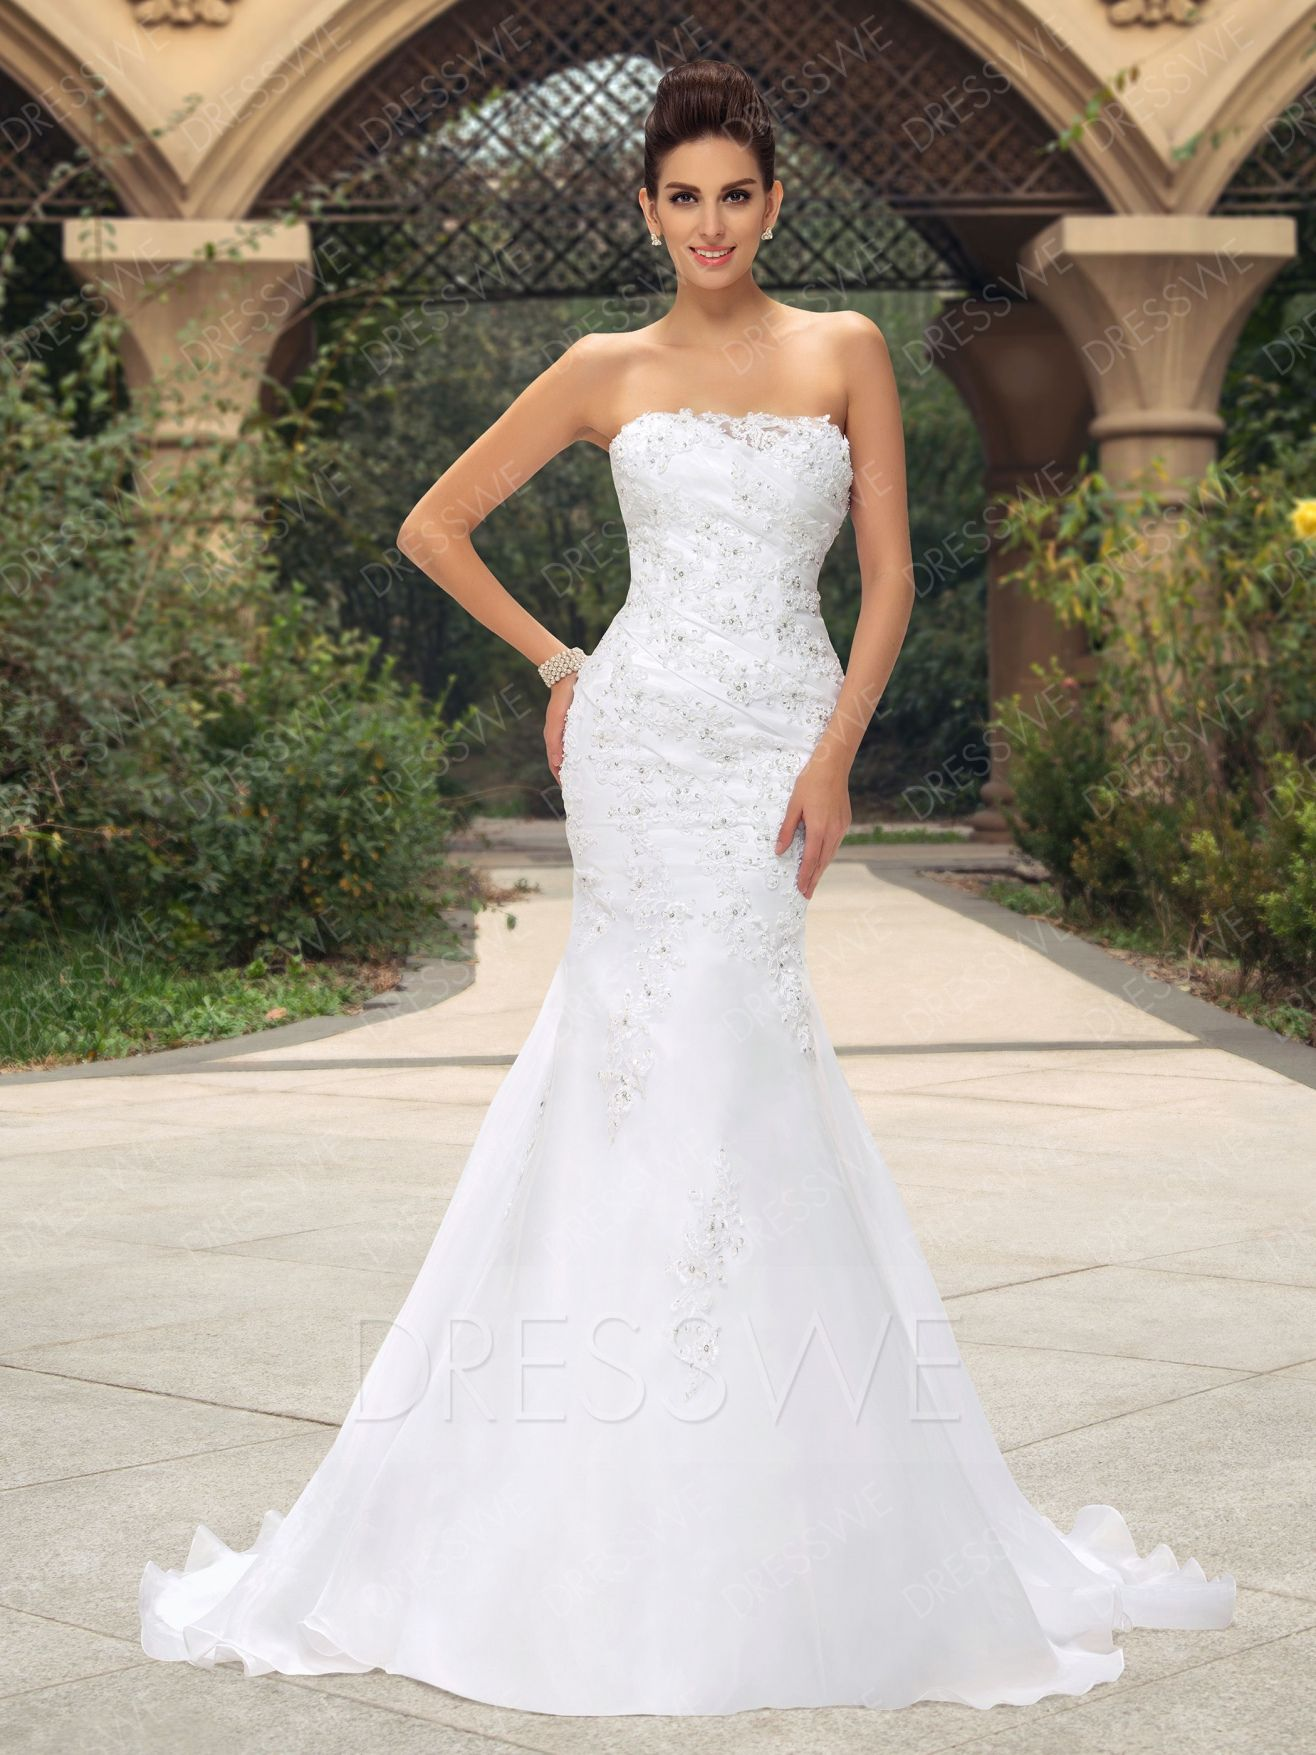 77+ Sequin Wedding Dress - Women\'s Dresses for Weddings Check more ...